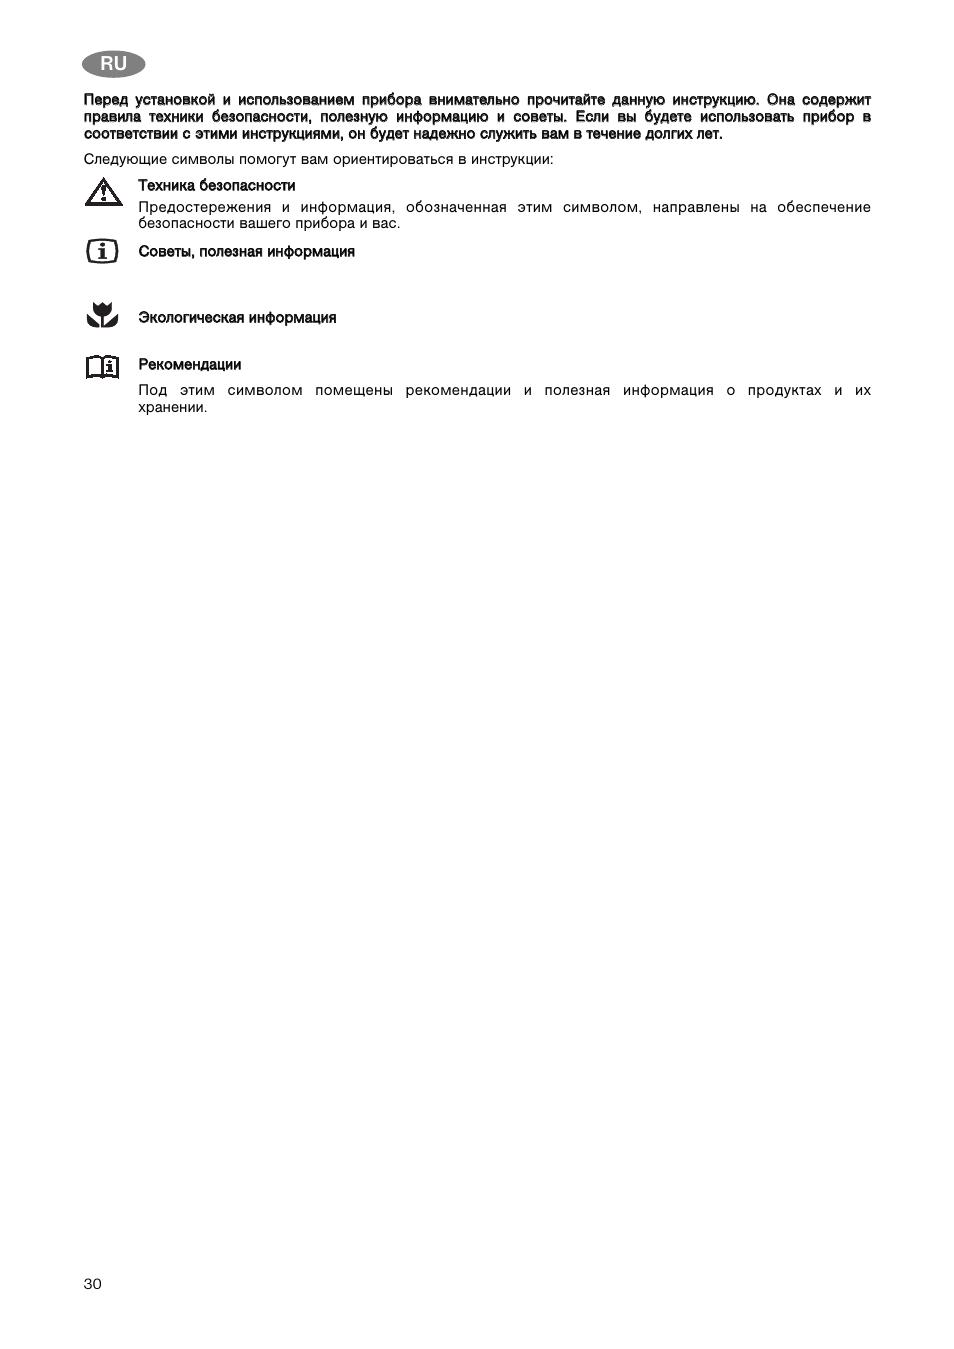 Инструкция по эксплуатации Zanussi ZK 24 11 GO   Страница 2   16 ... 2c191539c42